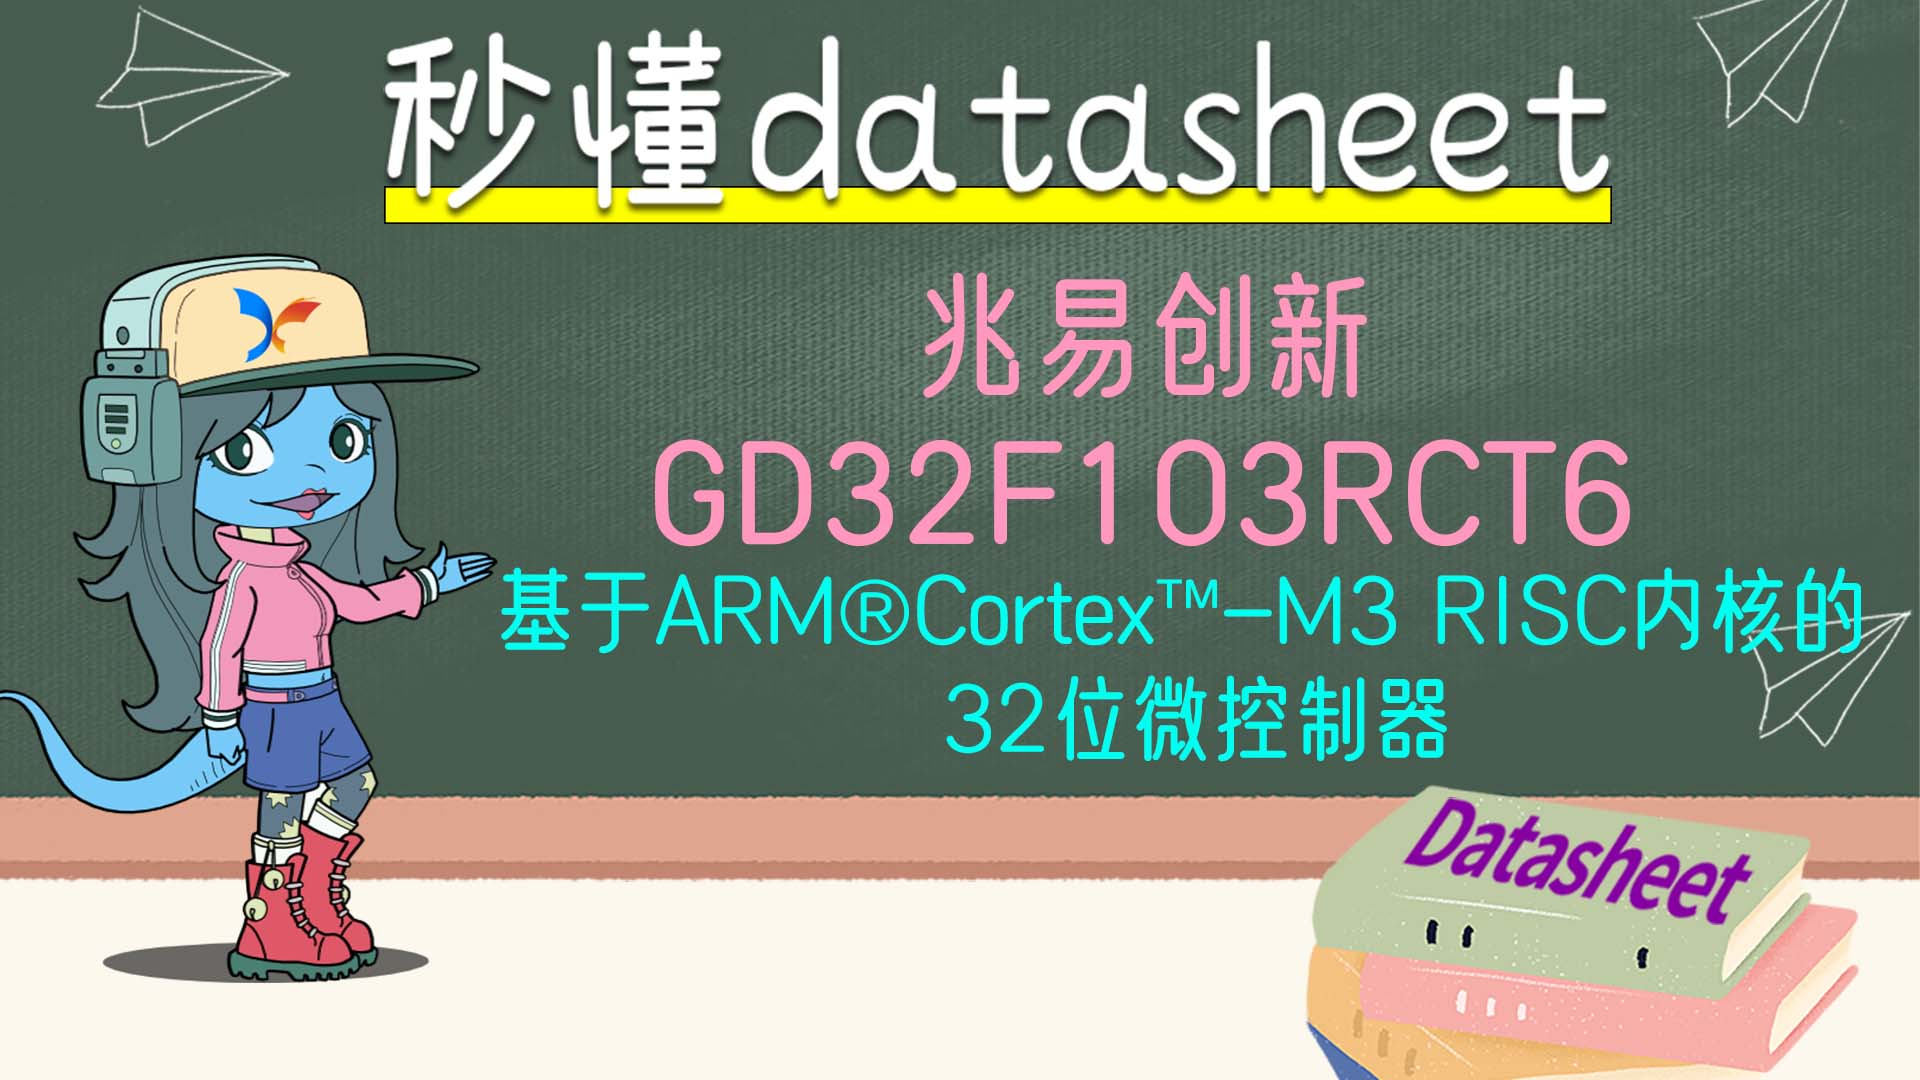 【秒懂datasheet】兆易创新 GD32F103RCT6微控制器